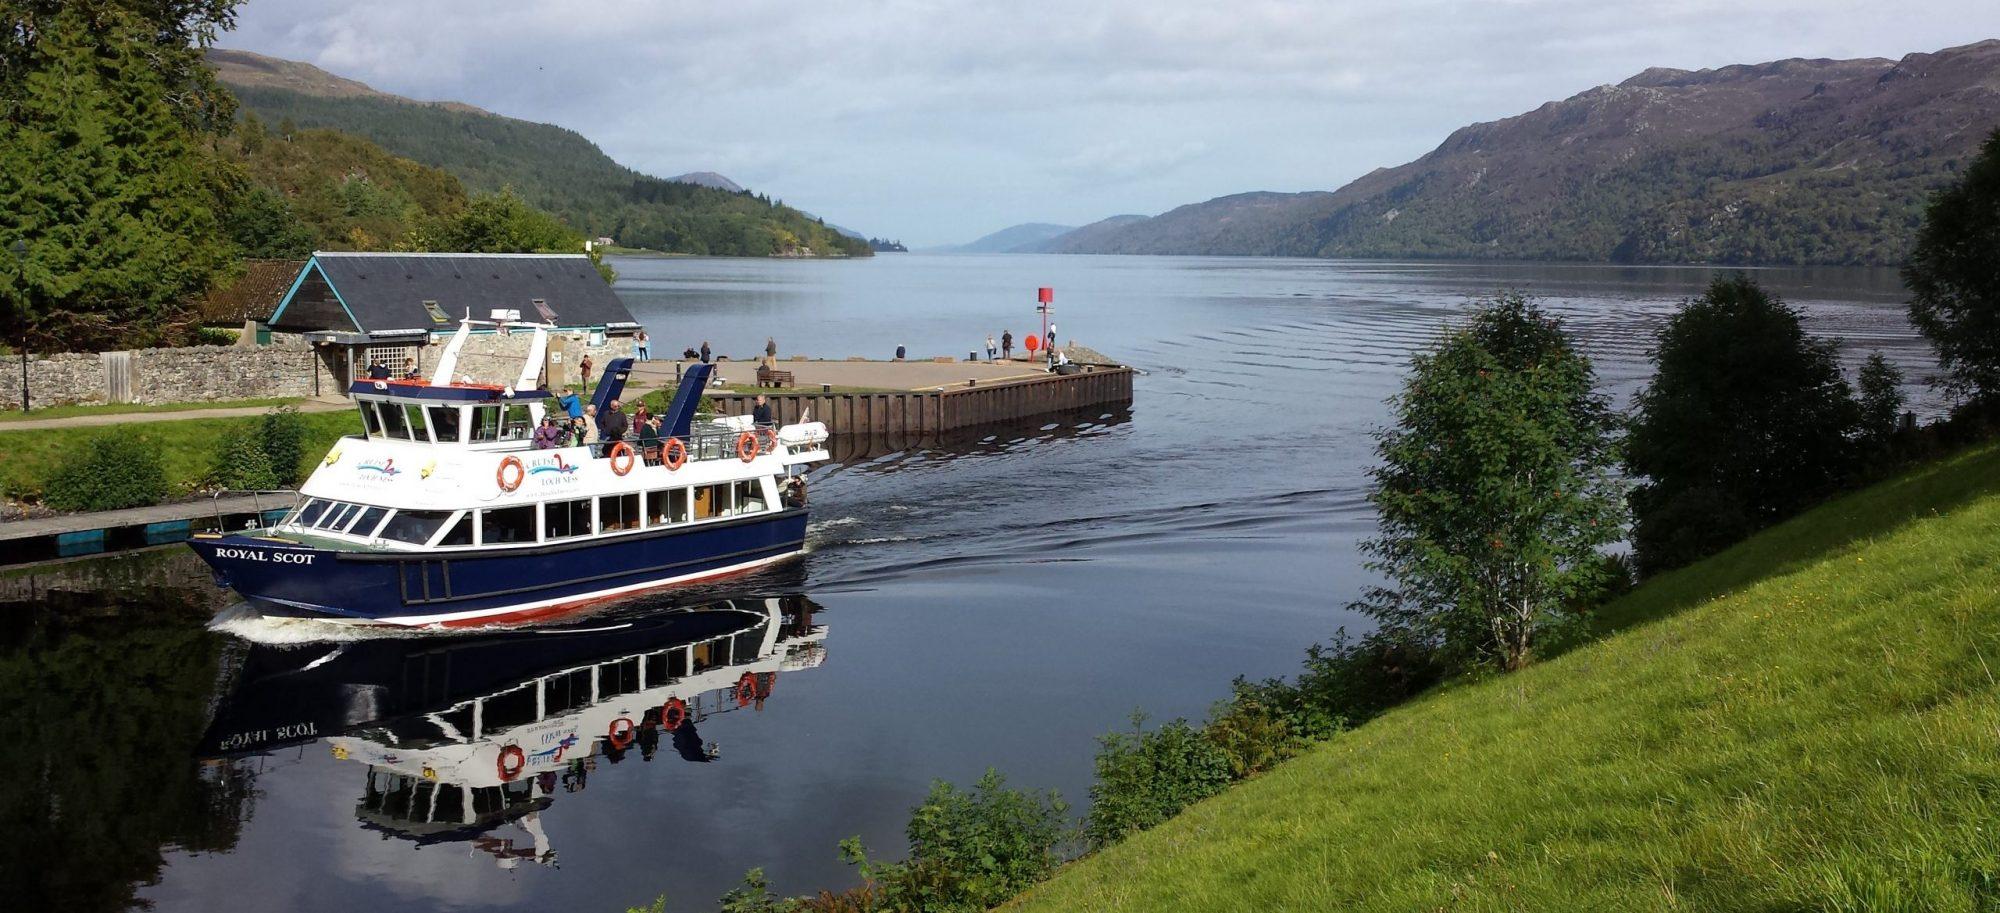 Crusie Loch Ness Scaled Aspect Ratio X